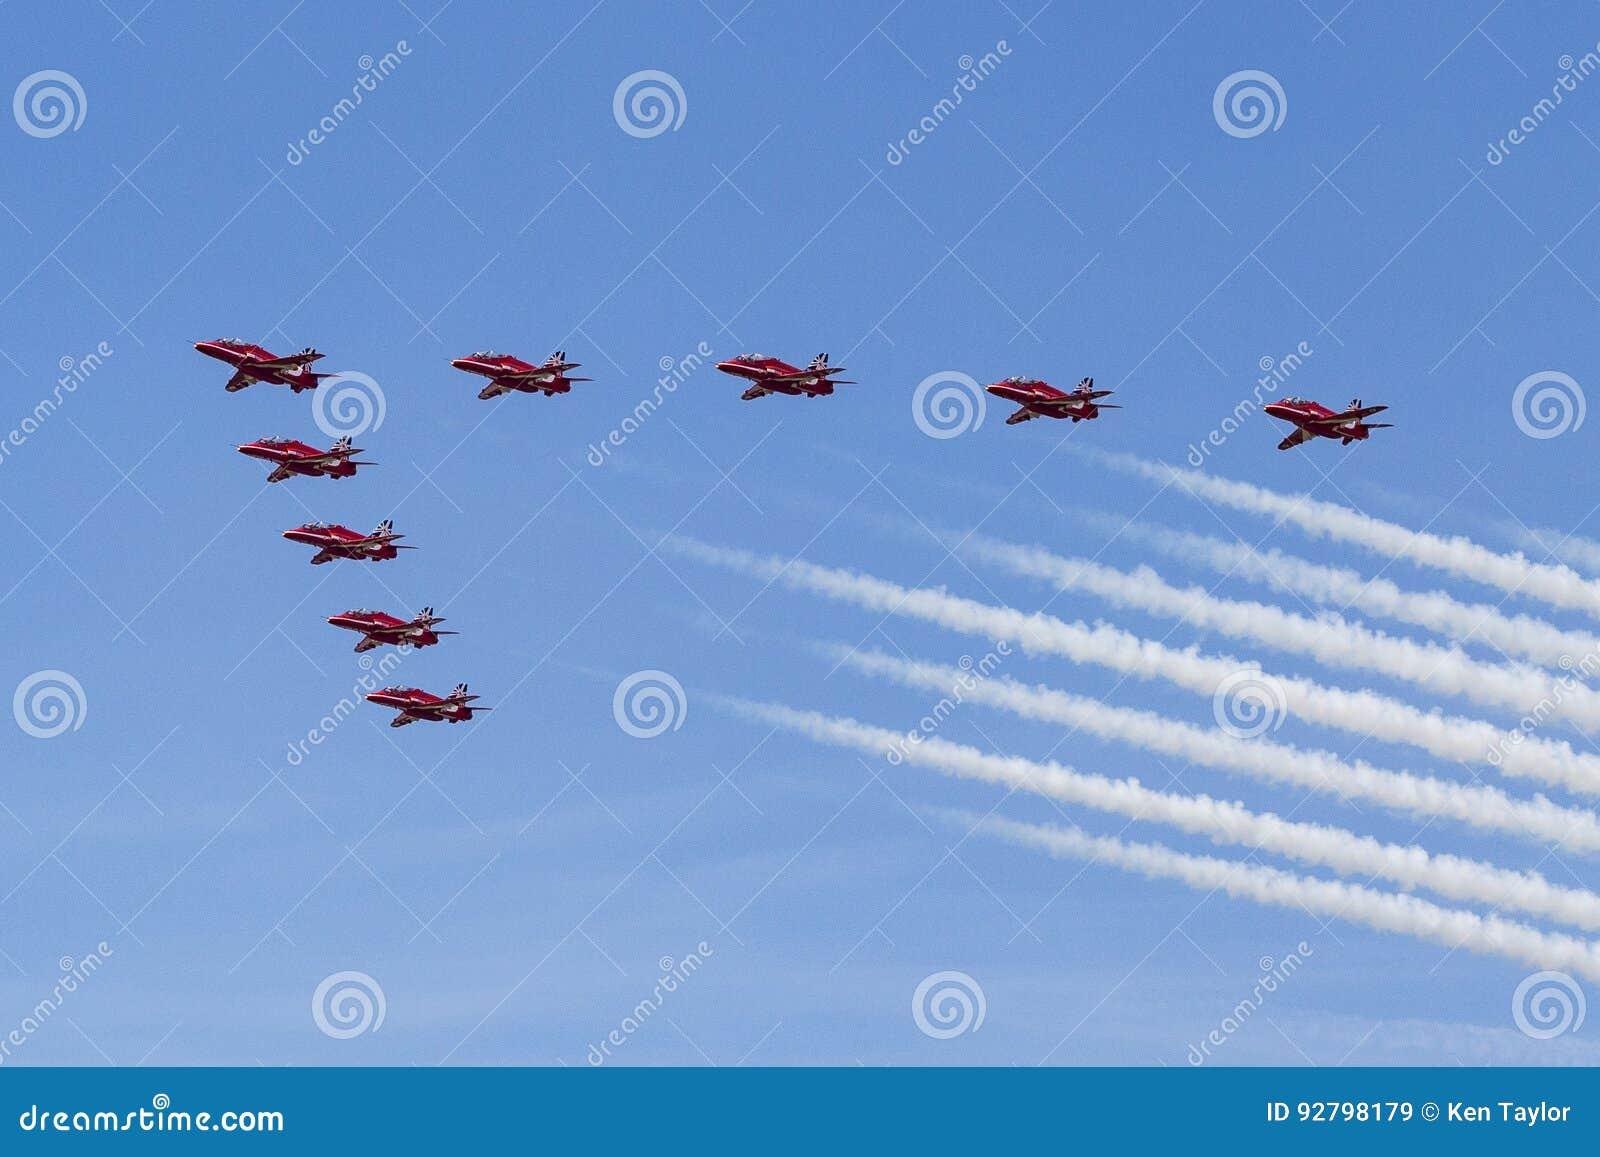 RAF Red Arrows in BAE Hawk T1 trainers